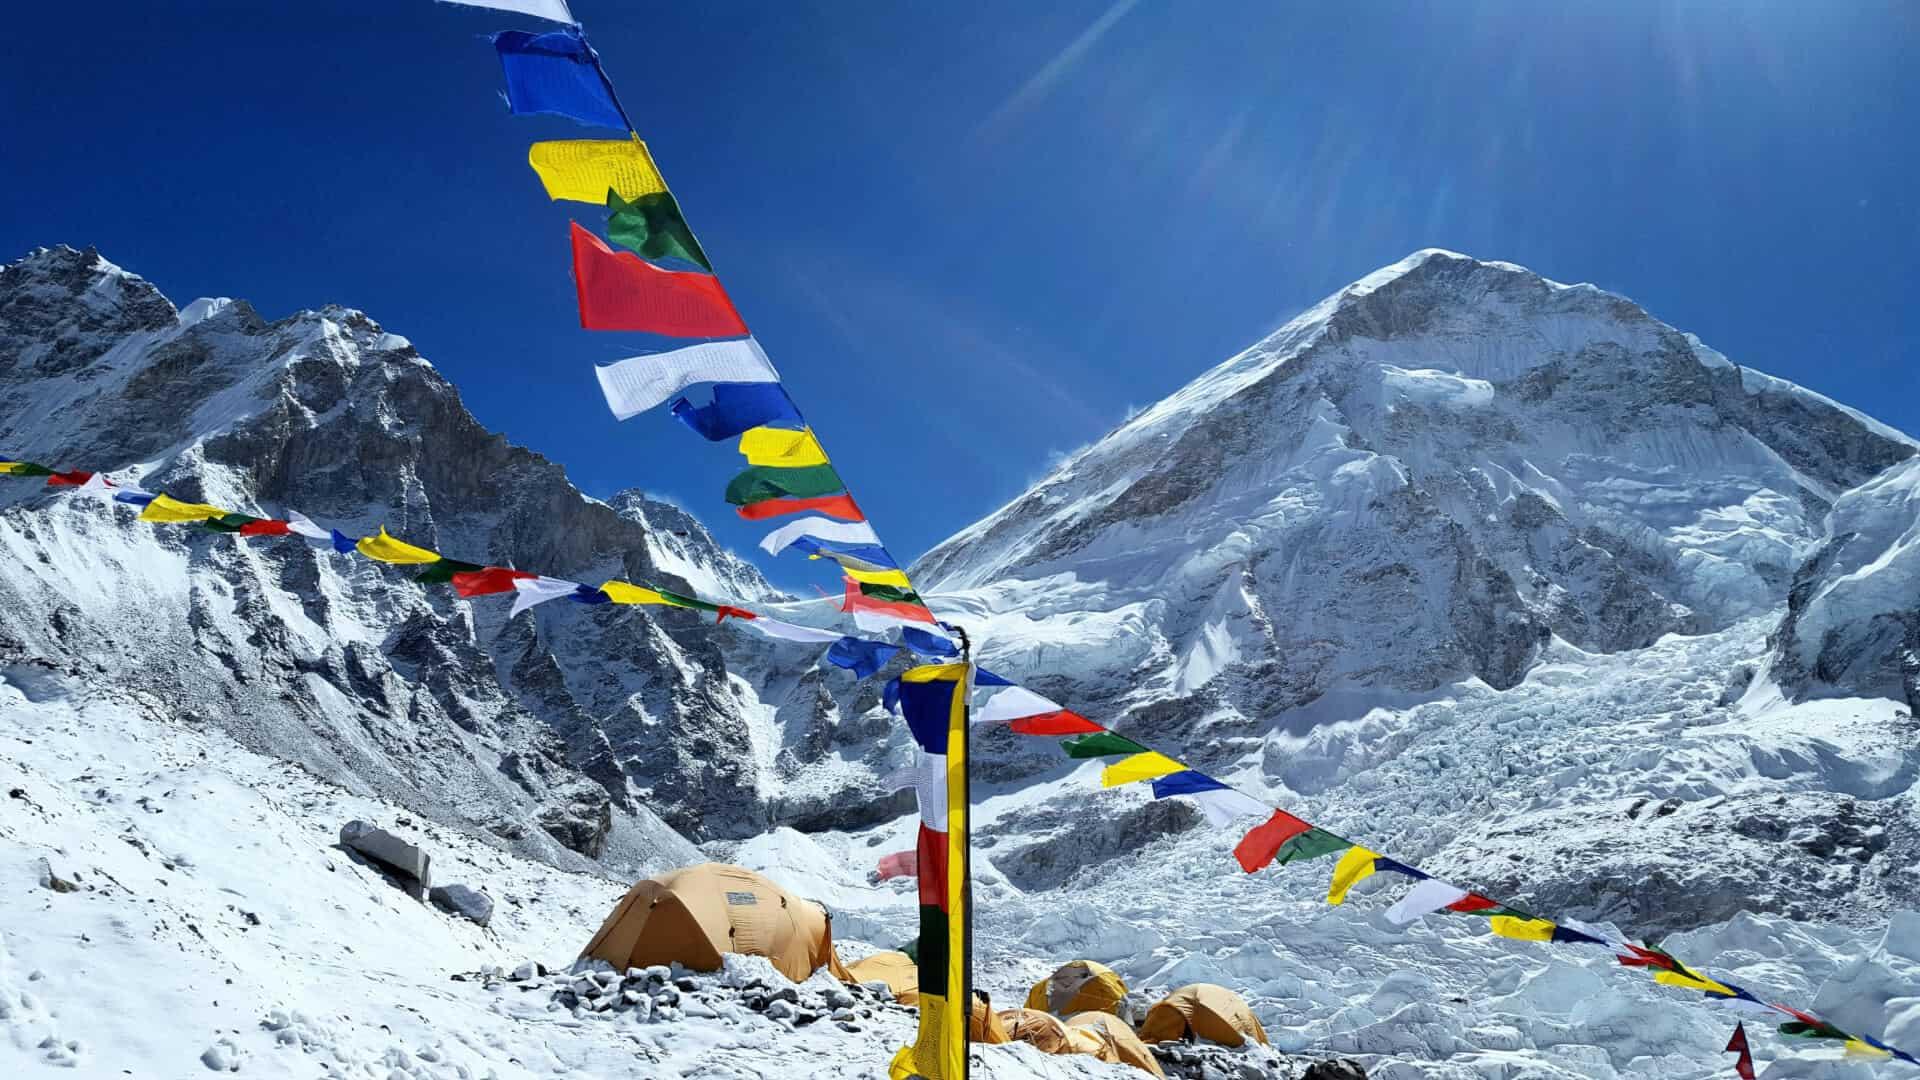 Tours and Trekking in Nepal Tibet and Bhutan